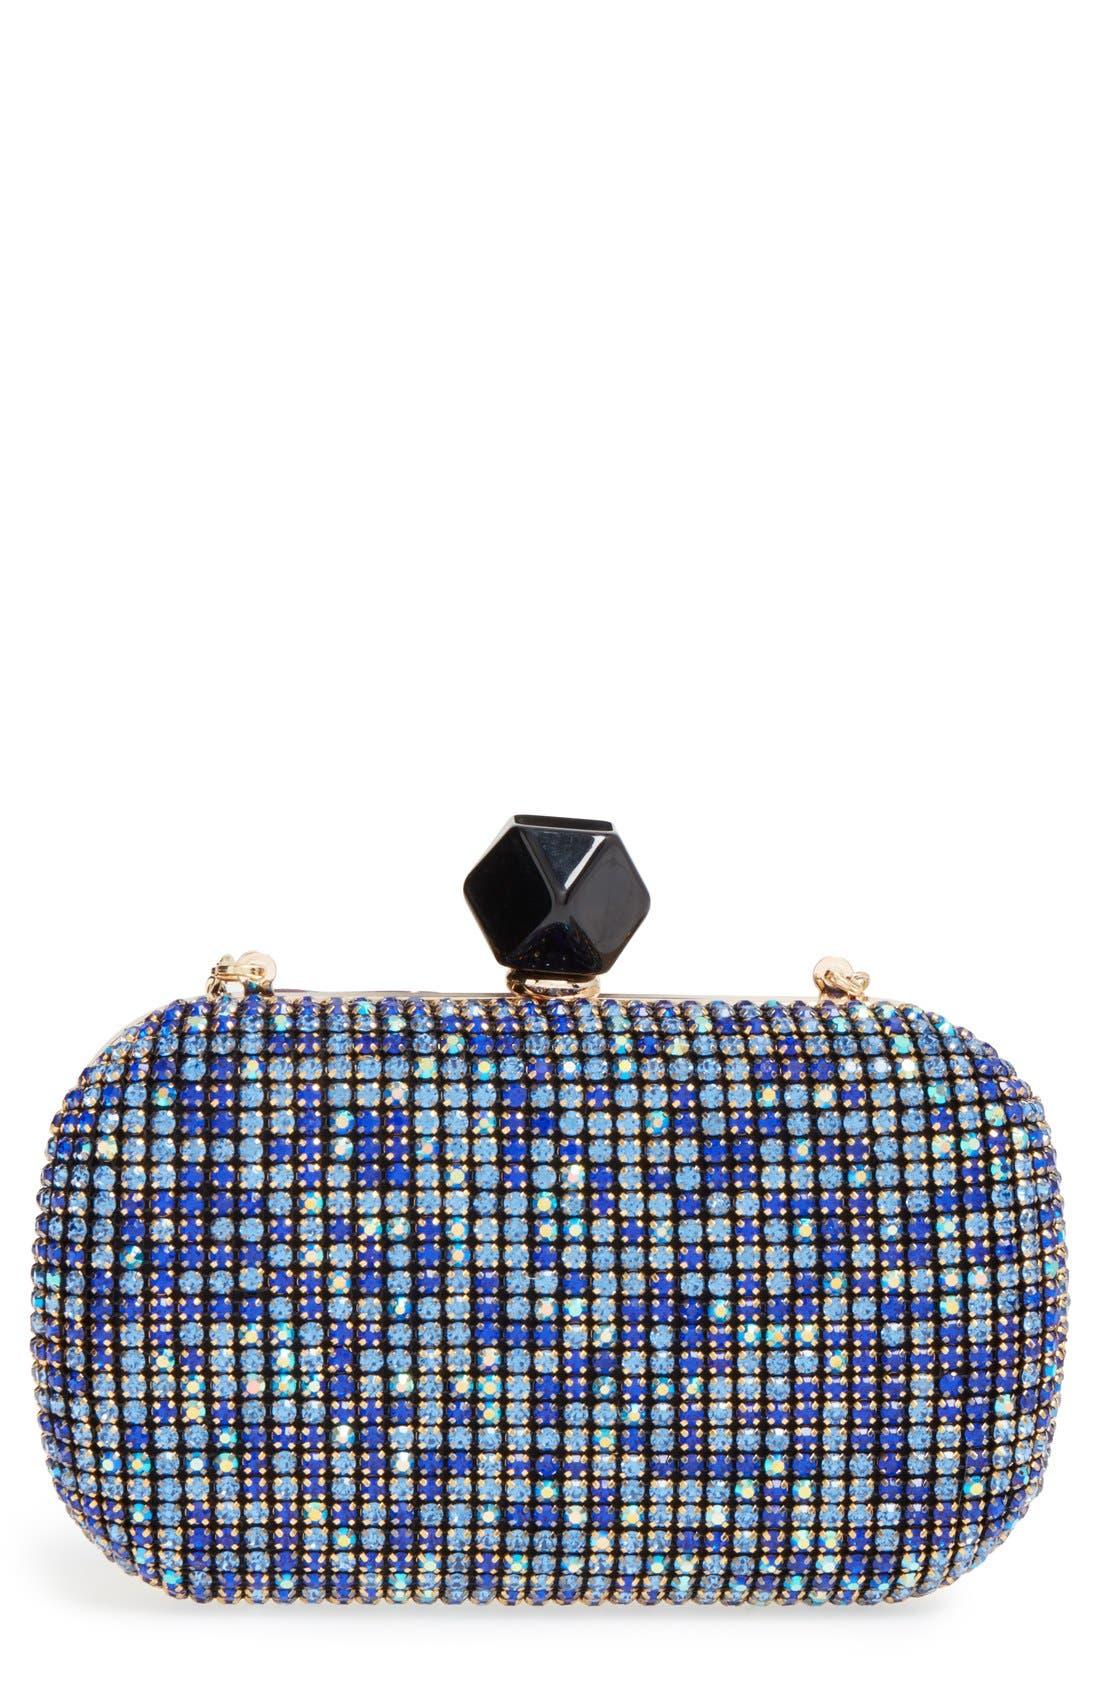 Alternate Image 1 Selected - Natasha Couture Crystal Box Clutch